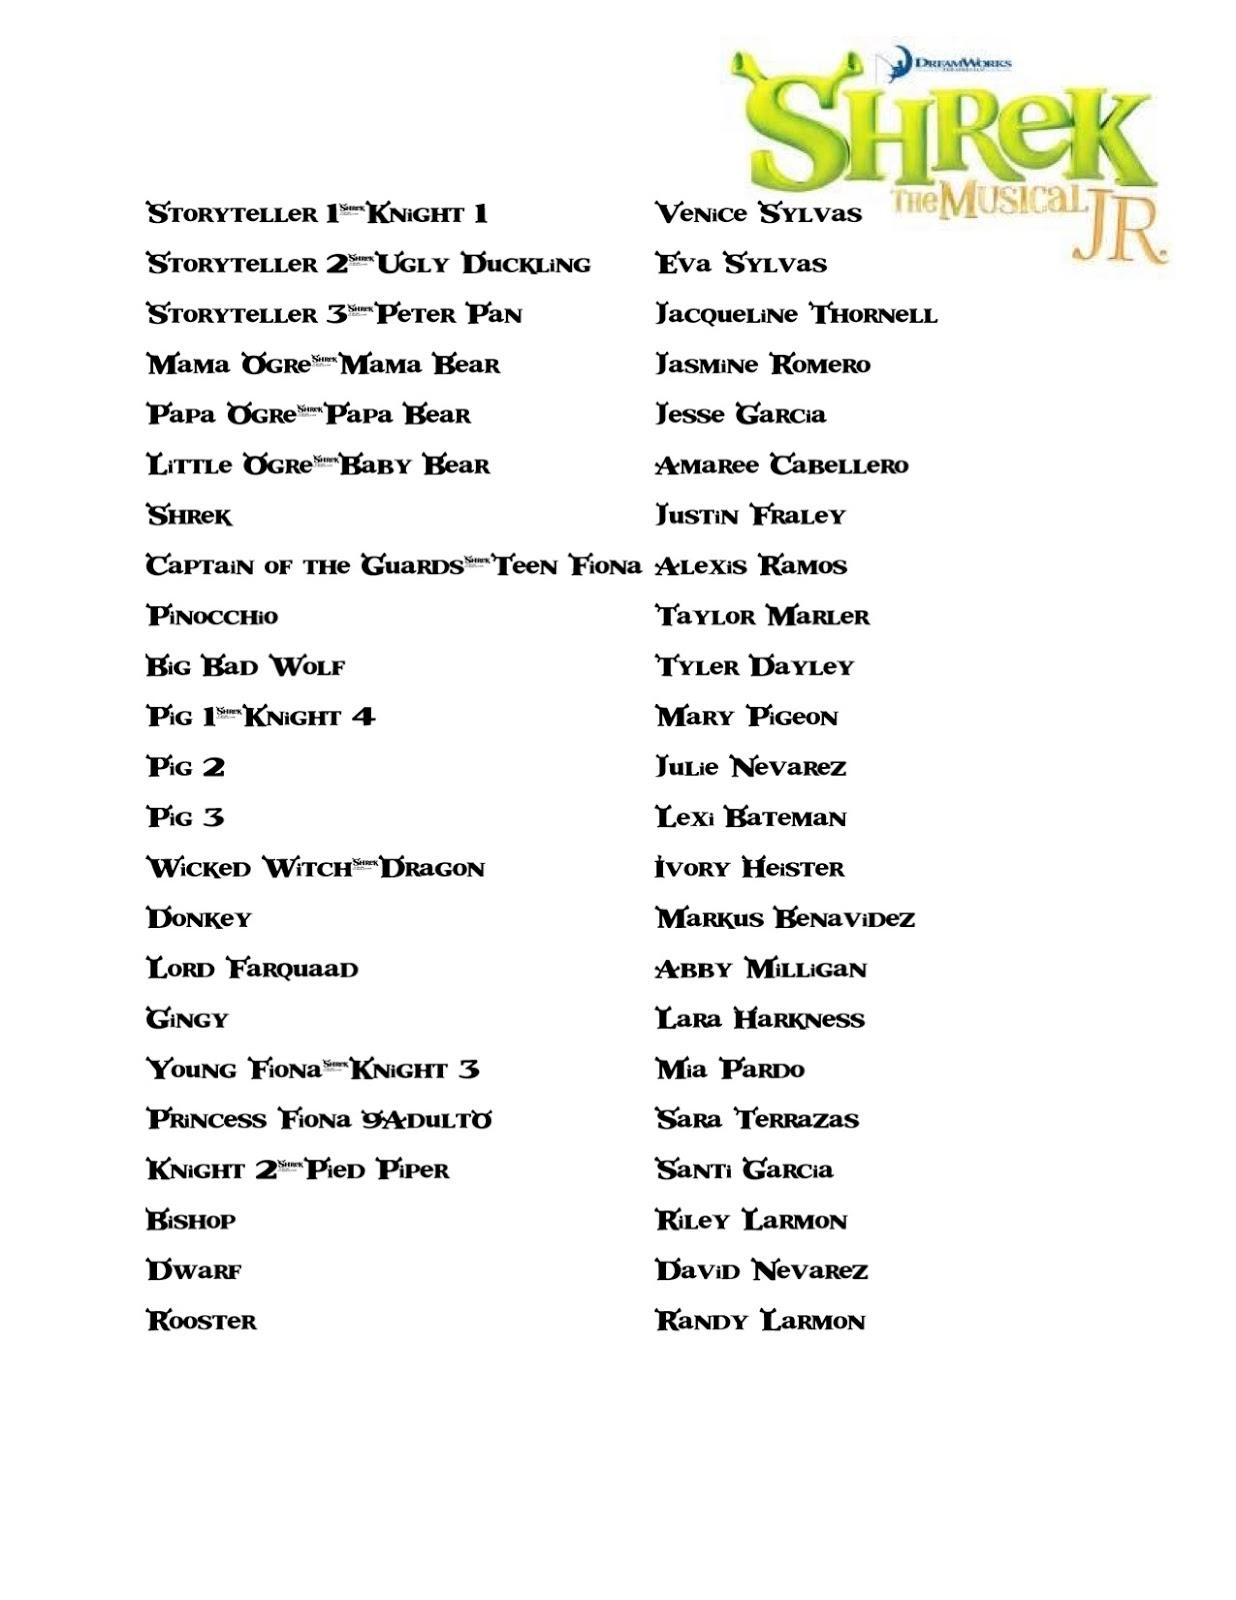 The Community Players Of Hobbs Shrek Cast List